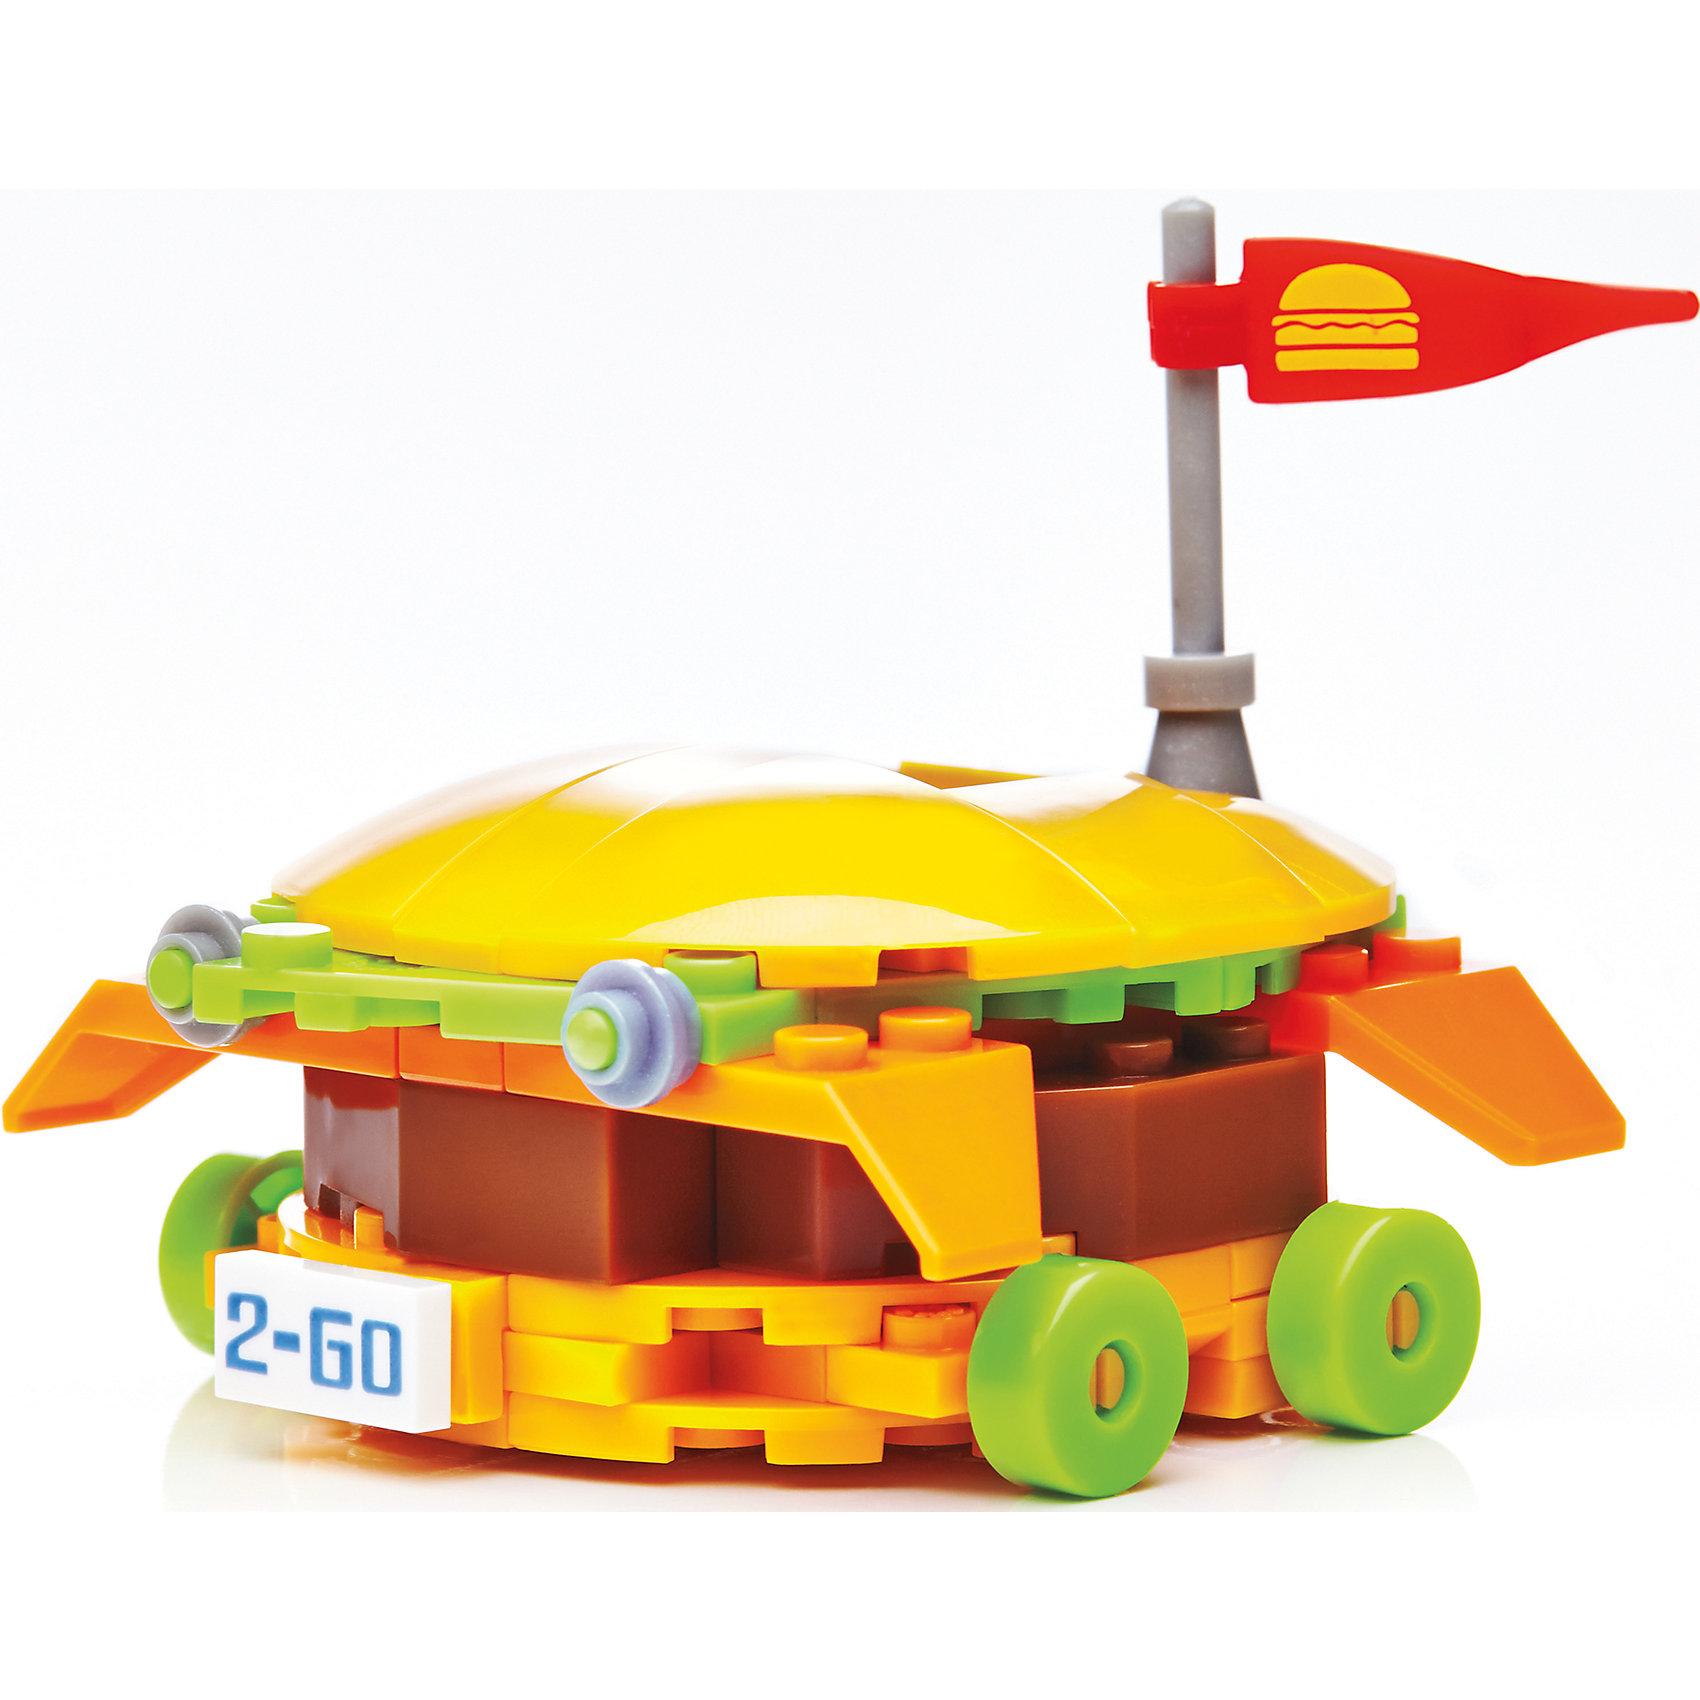 MEGA BLOKS Губка Боб: бургермобиль, MEGA BLOKS фигурка к конструктору mega bloks могучий рейнджер с планером